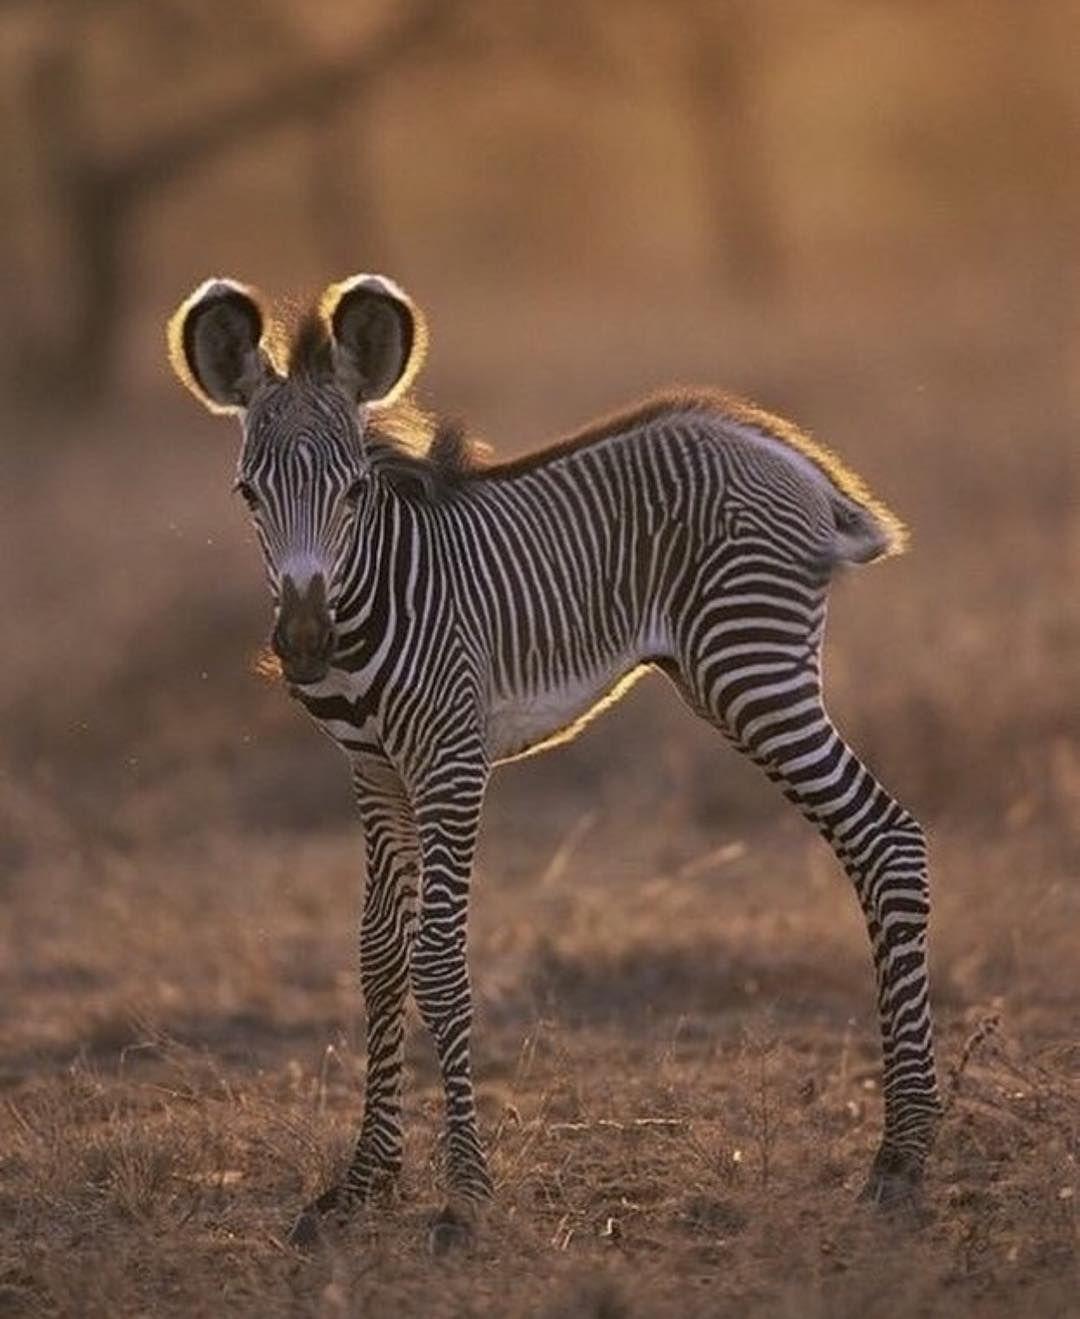 Schwarz oder Weiß die Fußspuren im Sand sind die gleichen ... @ africaniism. . ....-#africaniism #die #Fußspuren #gleichen #oder #Sand #Schwarz #sind #Weiß- Schwarz oder Weiß die Fußspuren im Sand sind die gleichen … @ africaniism. . . . Baby Zebra | James Warwick. . CheckoutAfrica.com | #CheckoutAfrica #tanzania #motivational #African #Zambia #Zimbabwe #animals #smile #daringescapes #southafrica #animallover #ethiopia #beautiful #Romance #endangered #Africa #Inspirational #colorful #tanzania #